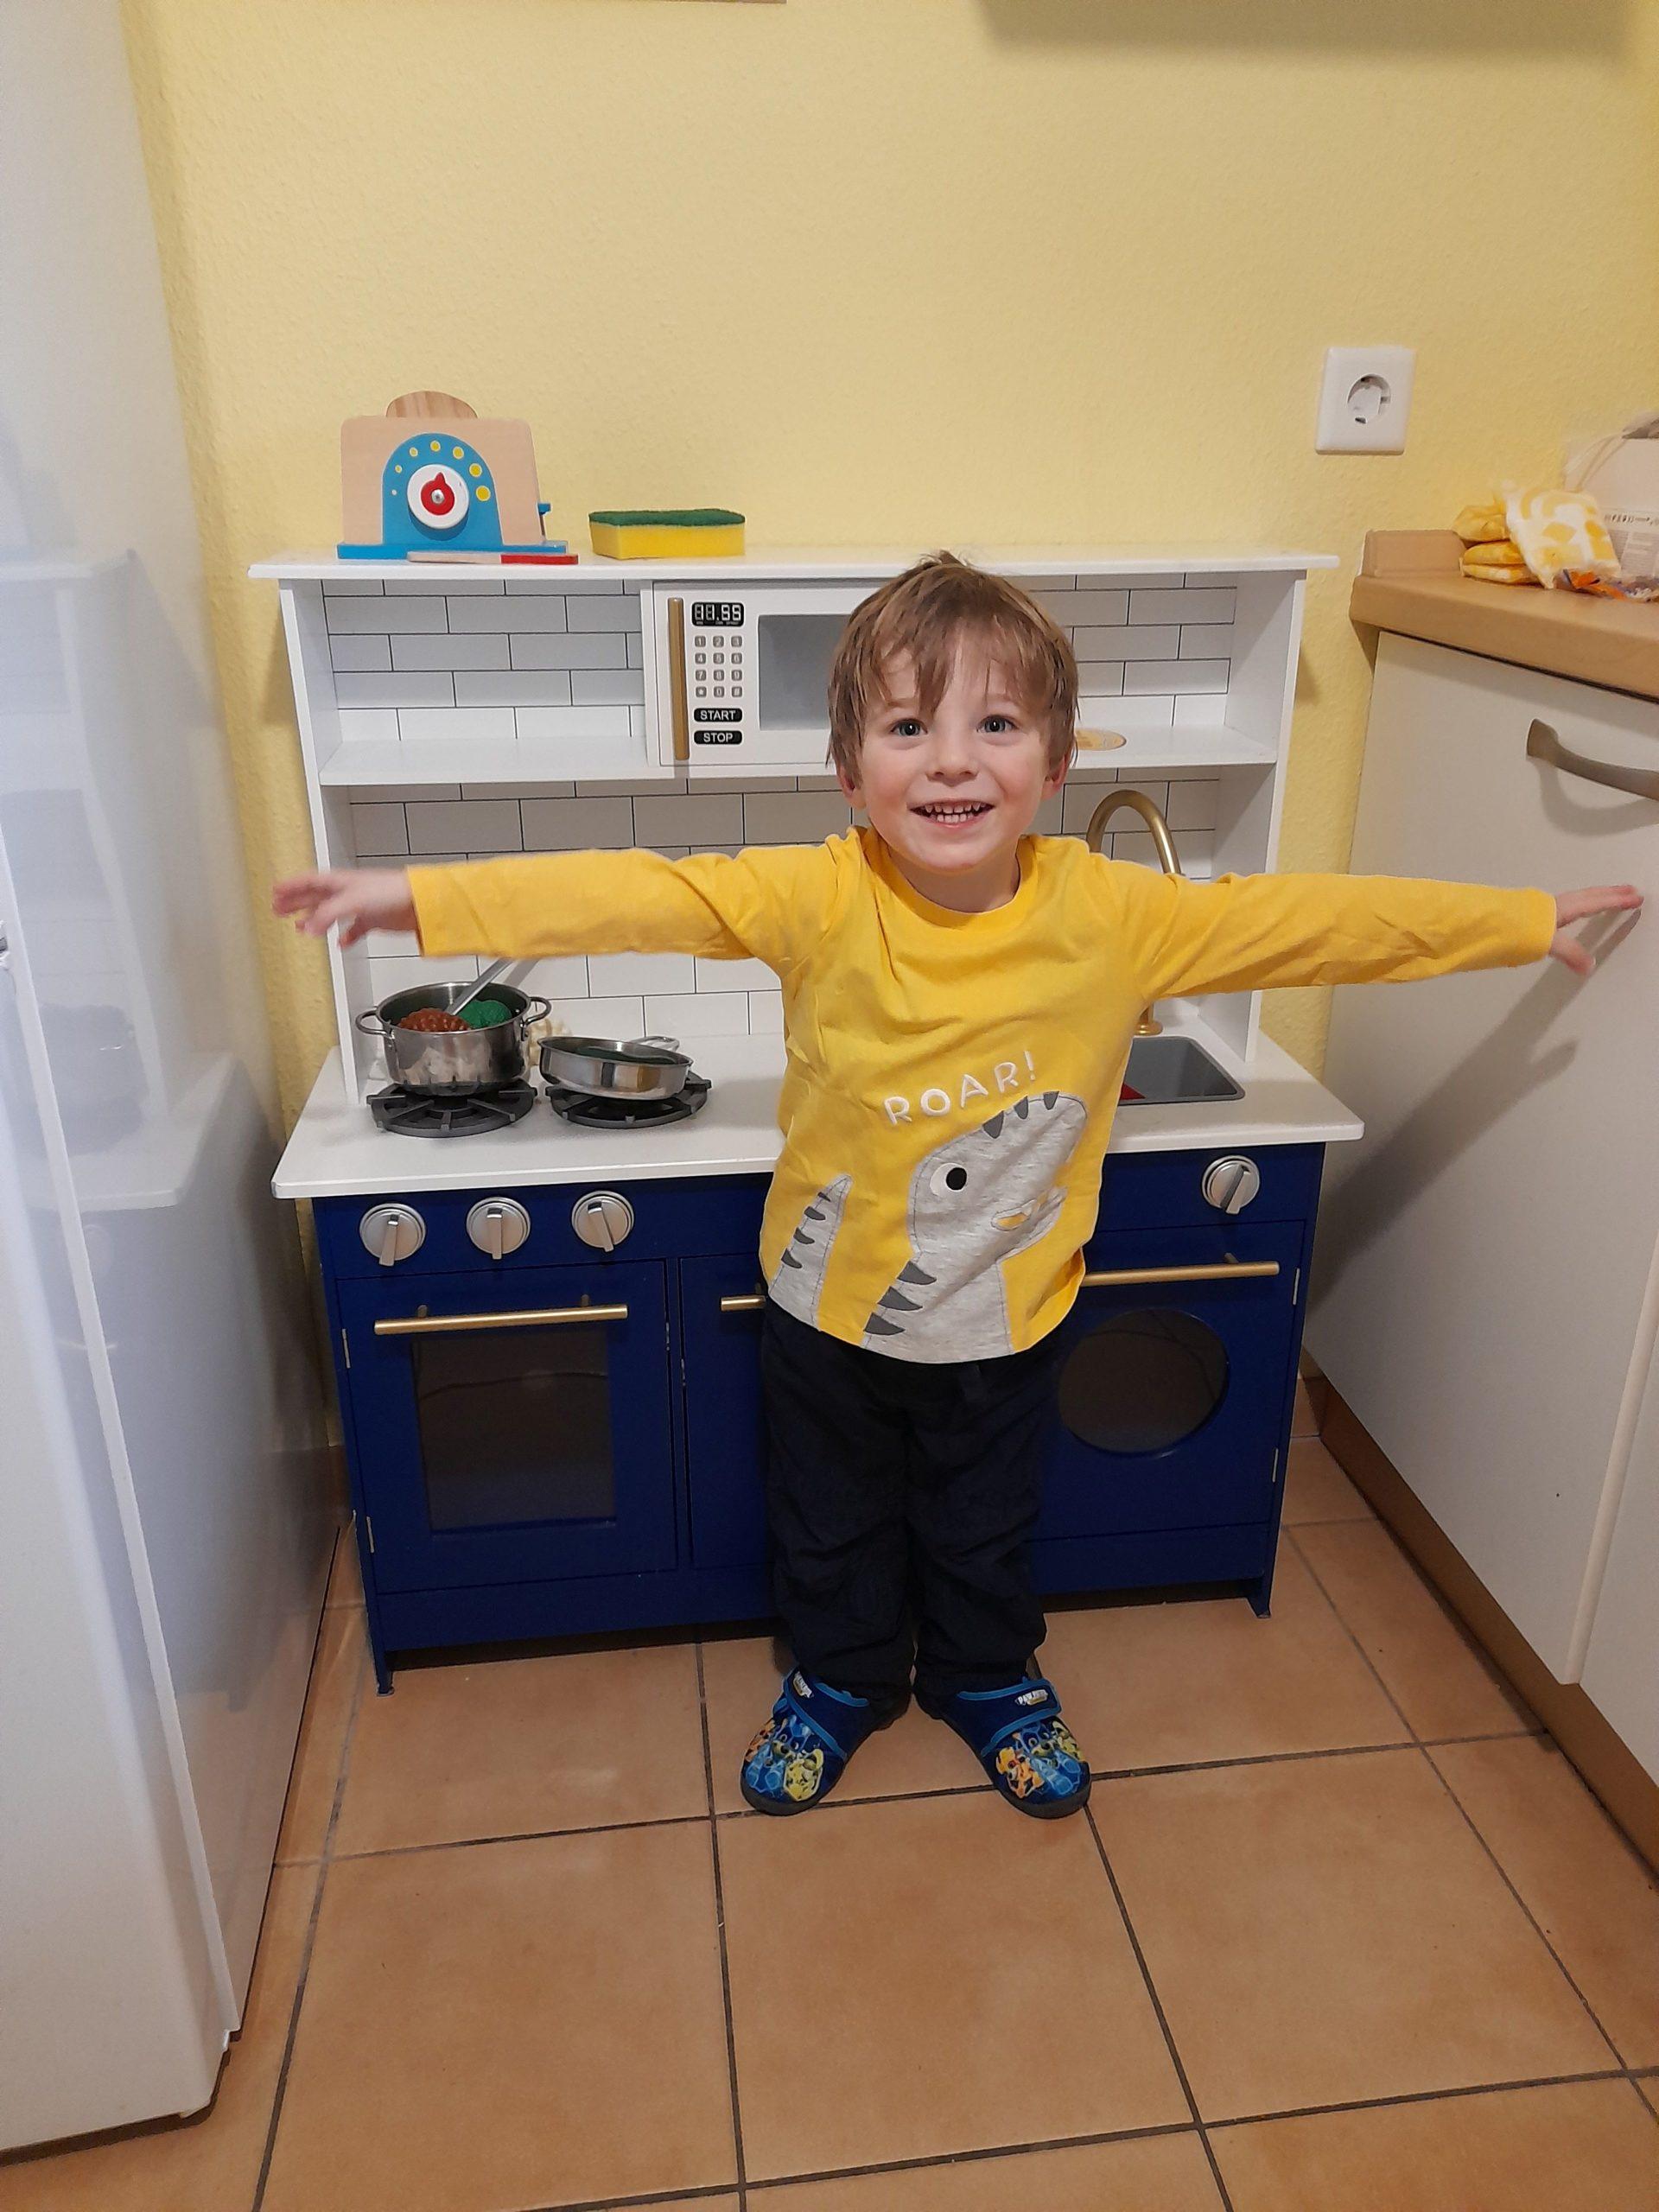 2.5-year-old in toy kitchen